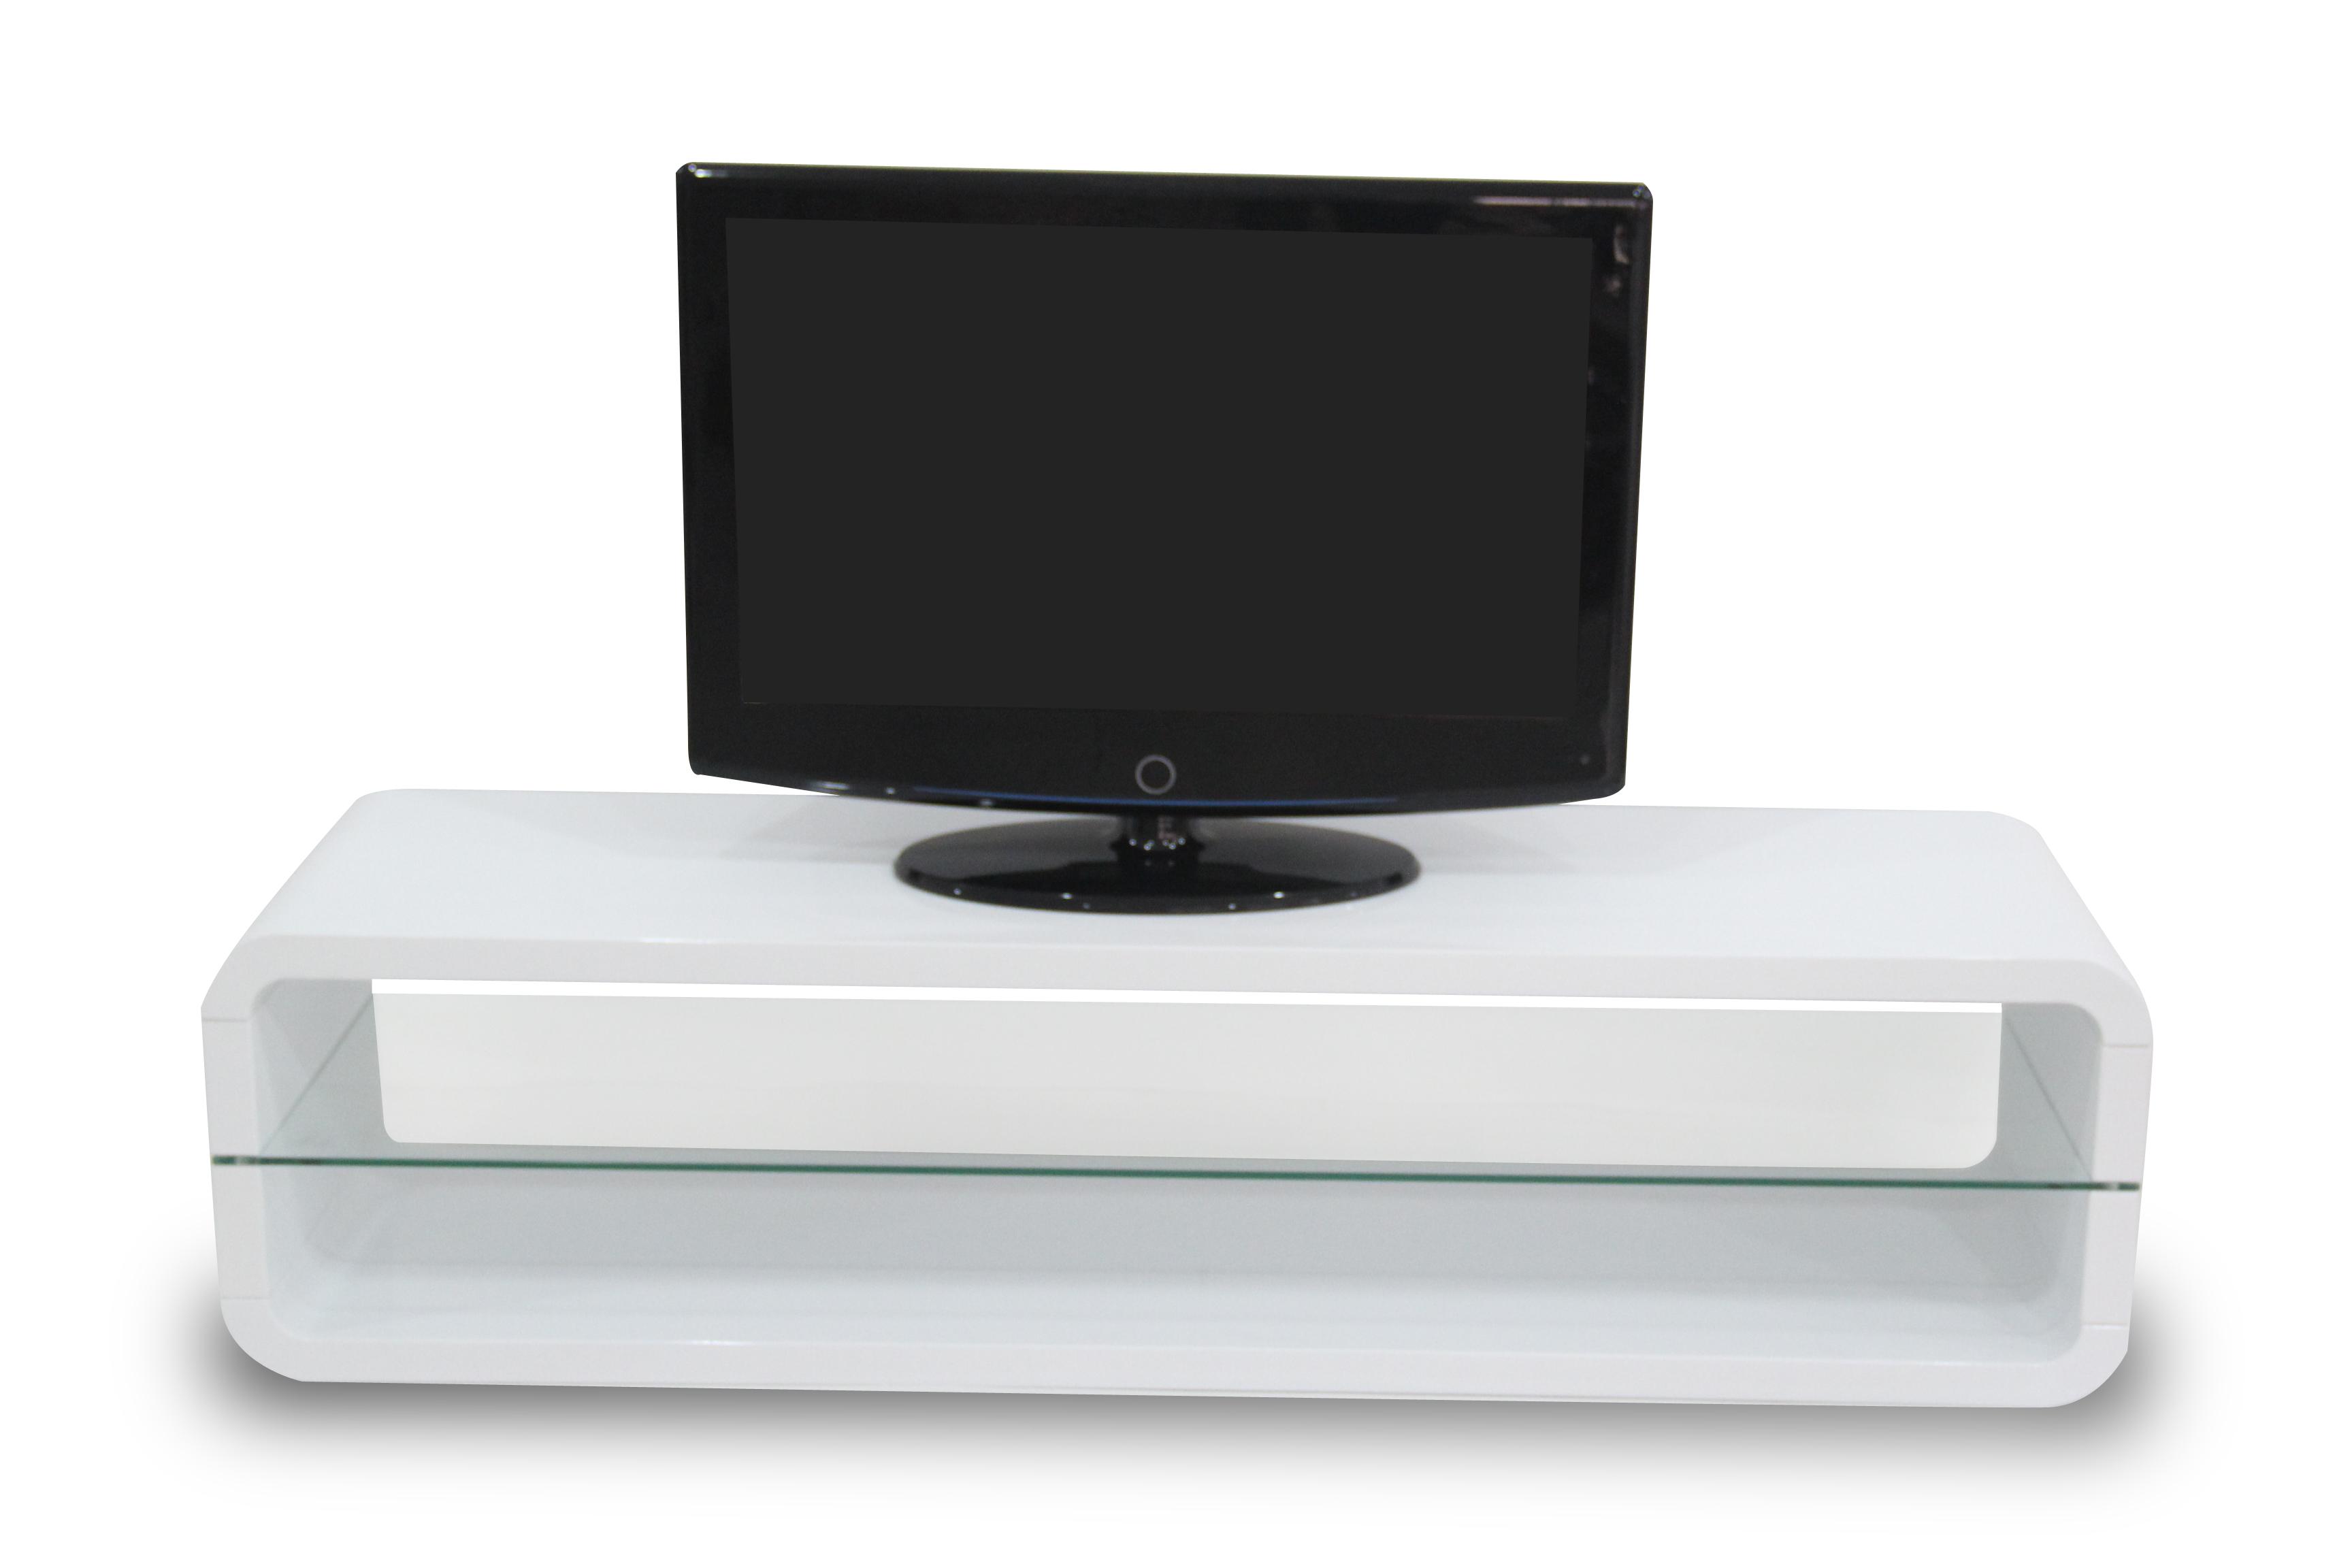 R 2100 Meuble Tv Lcd 140 Cm Blanc Laqu Modiva # Meuble Laque Blanc Tv